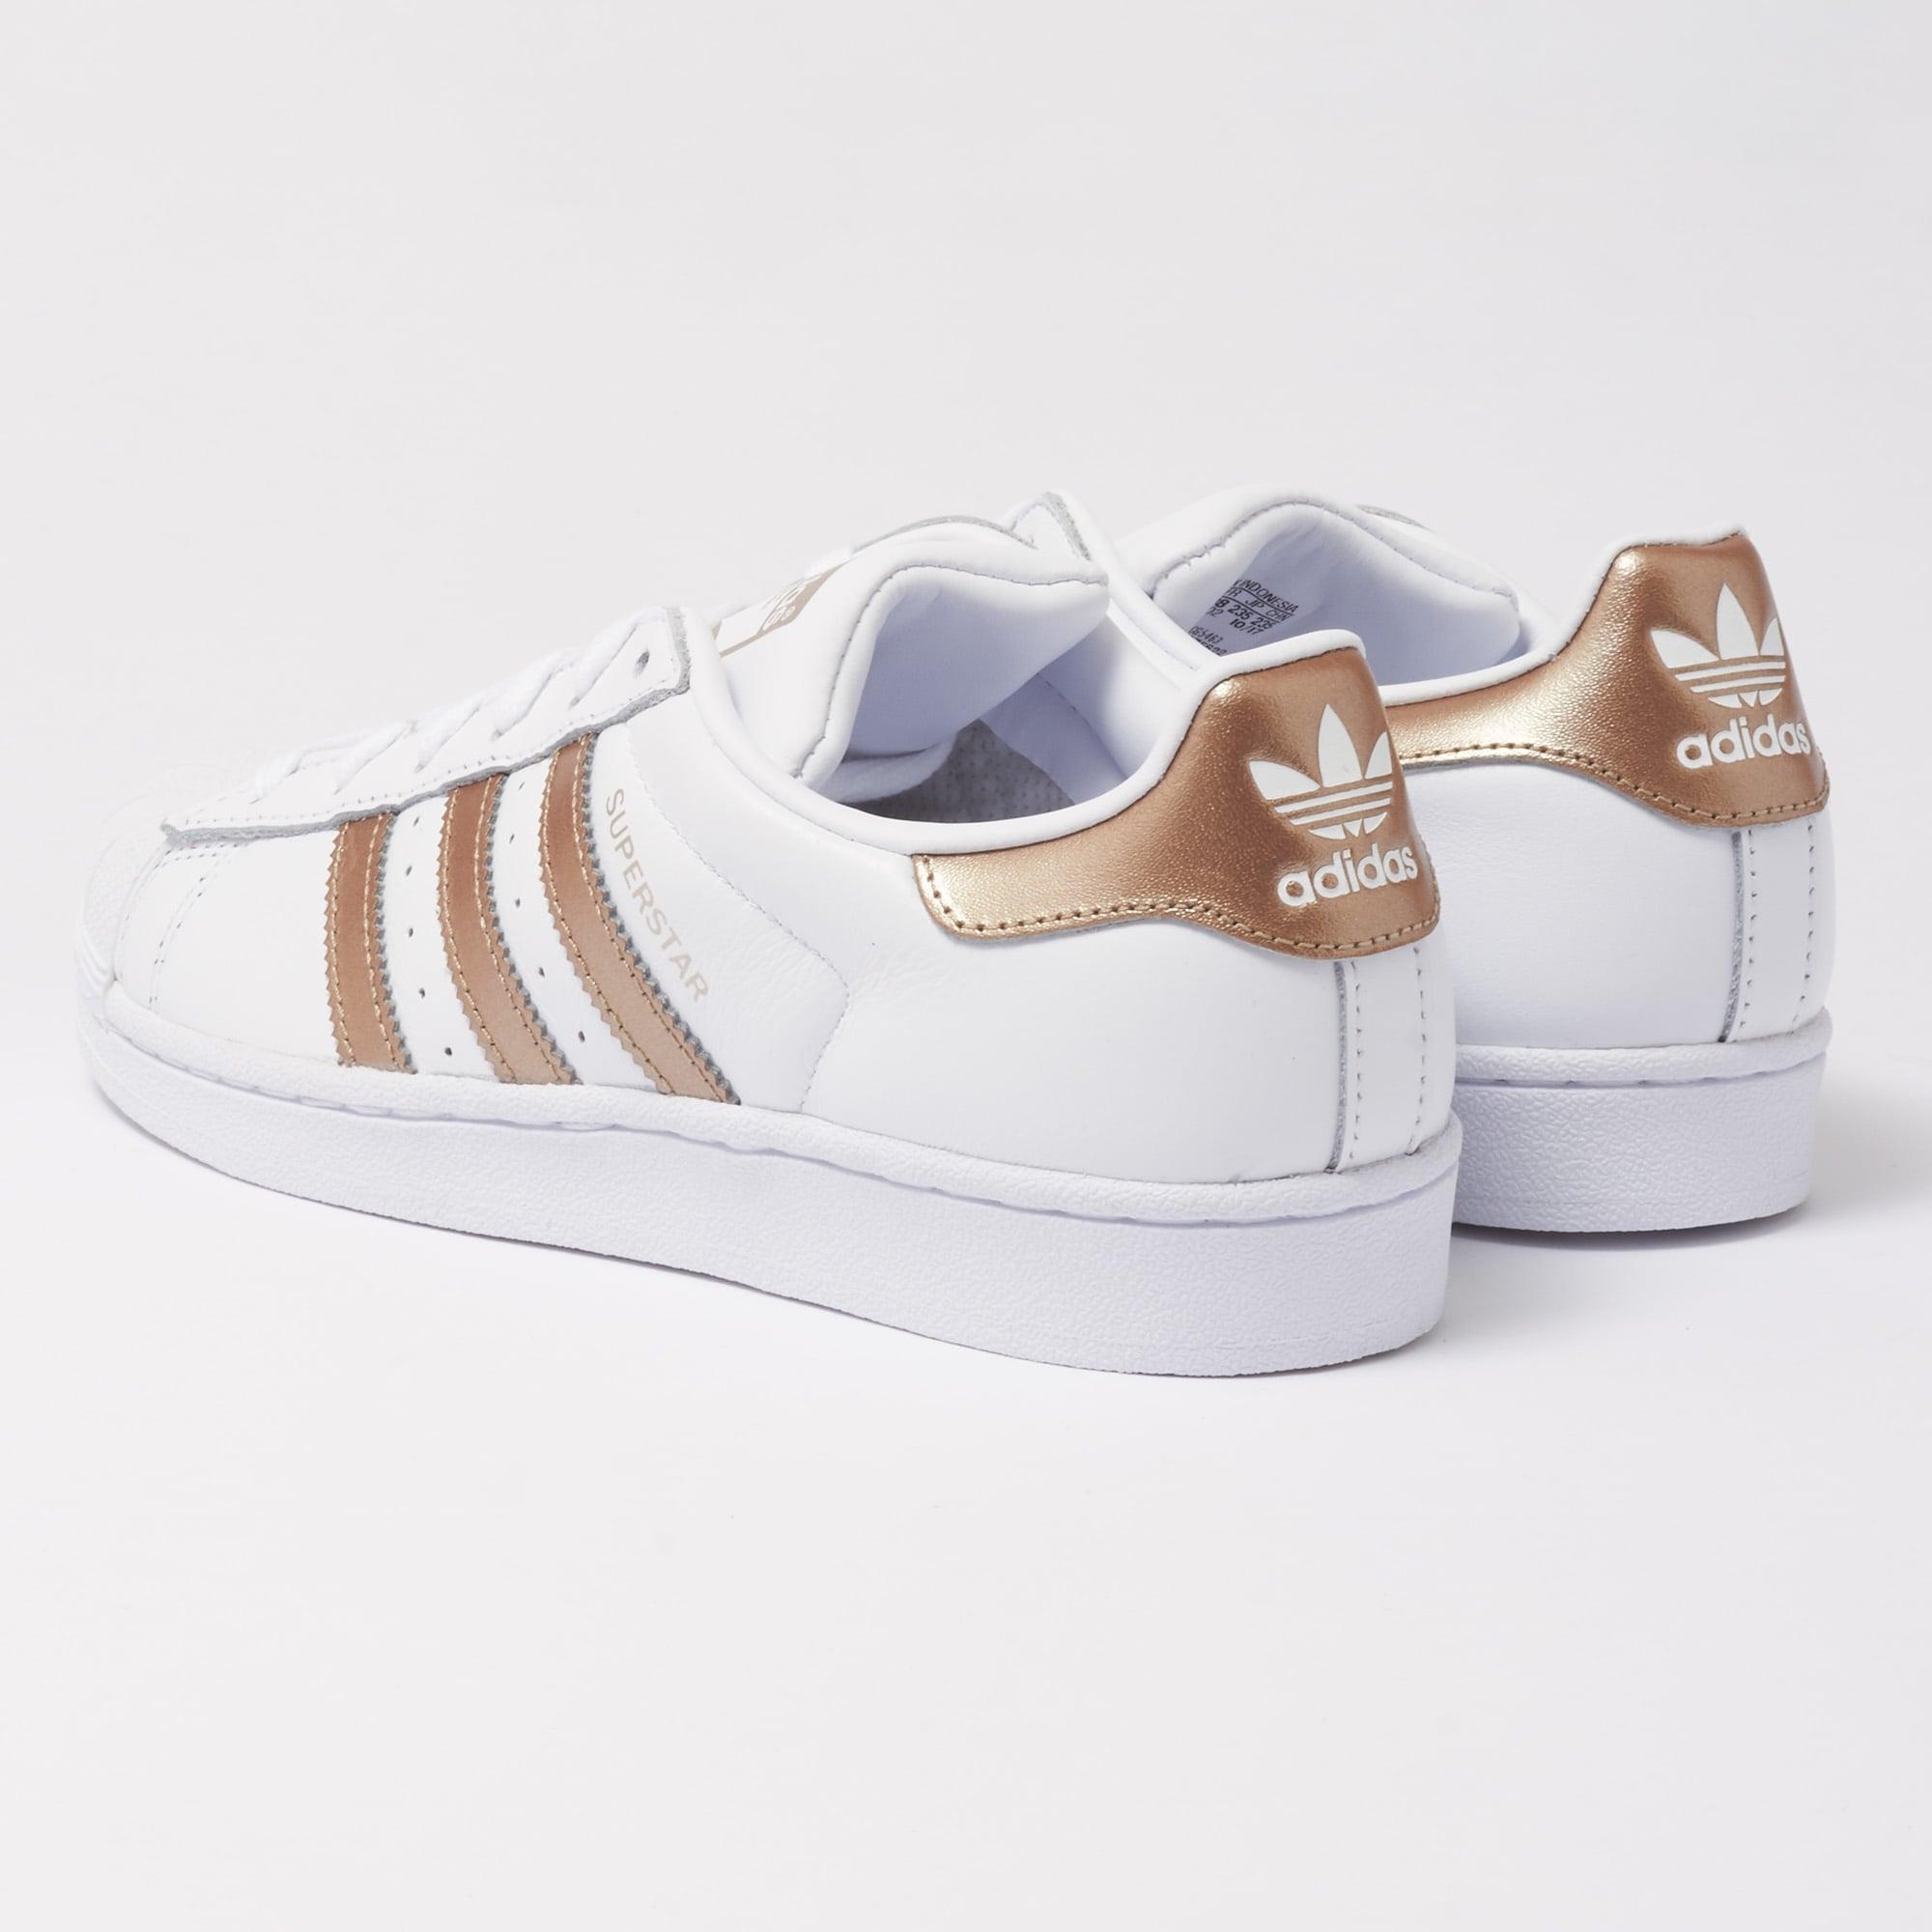 509c73624dc067 Adidas Originals Womens Superstar Sneakers